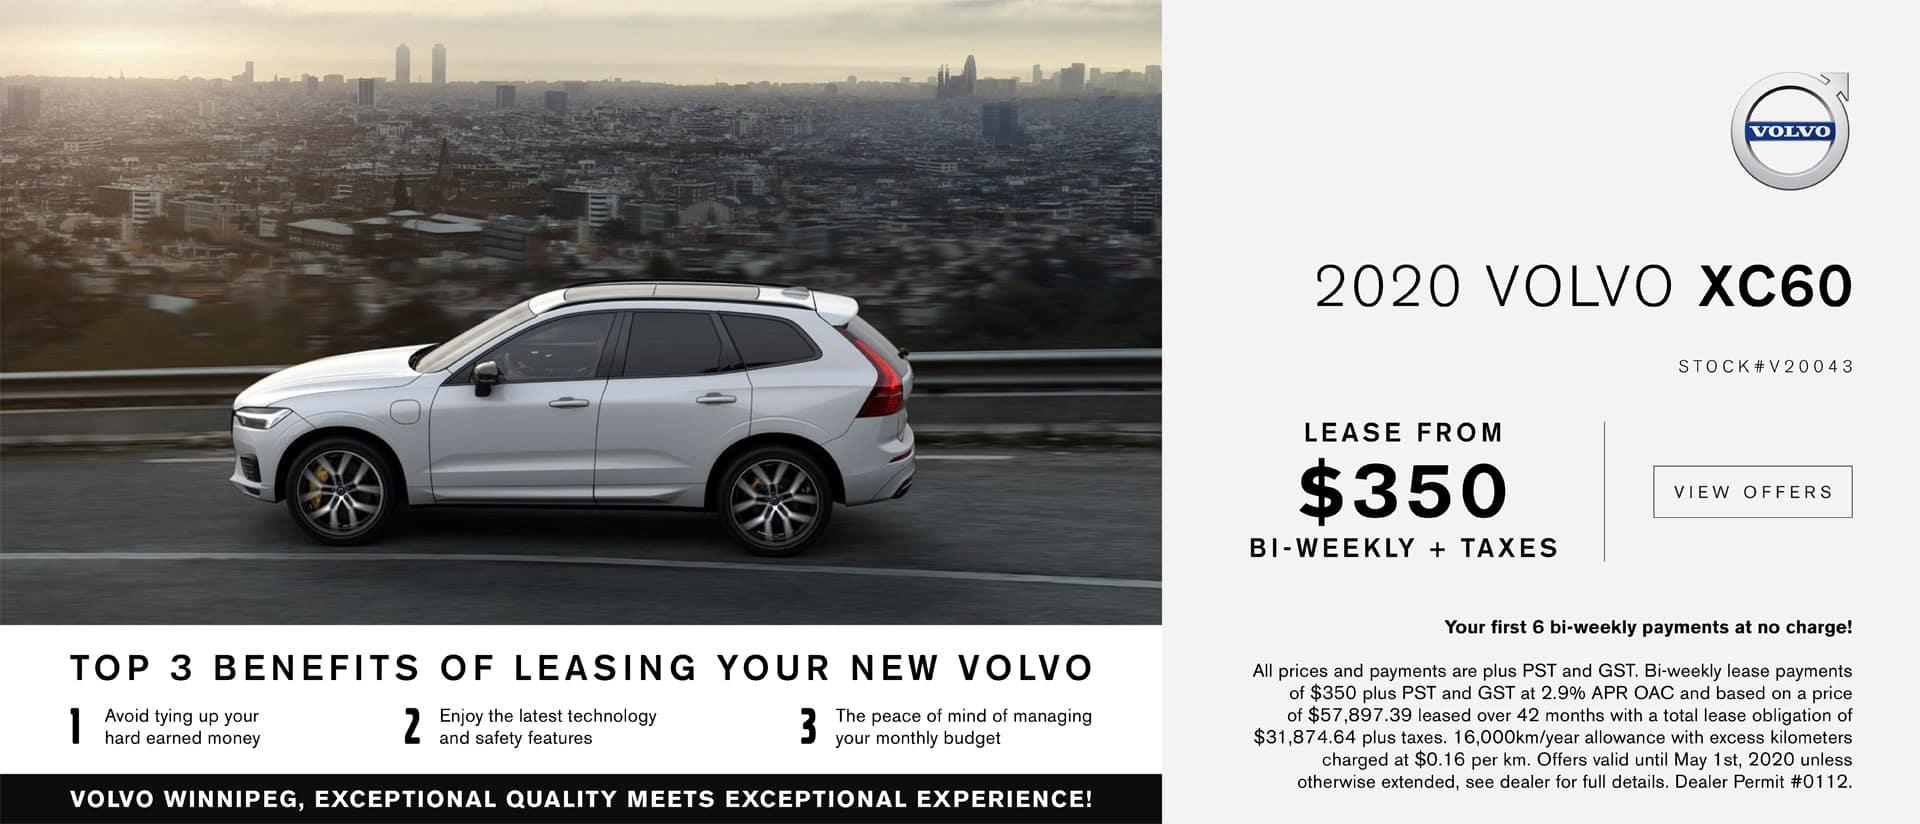 Volvo Winnipeg April XC60 Lease Offer